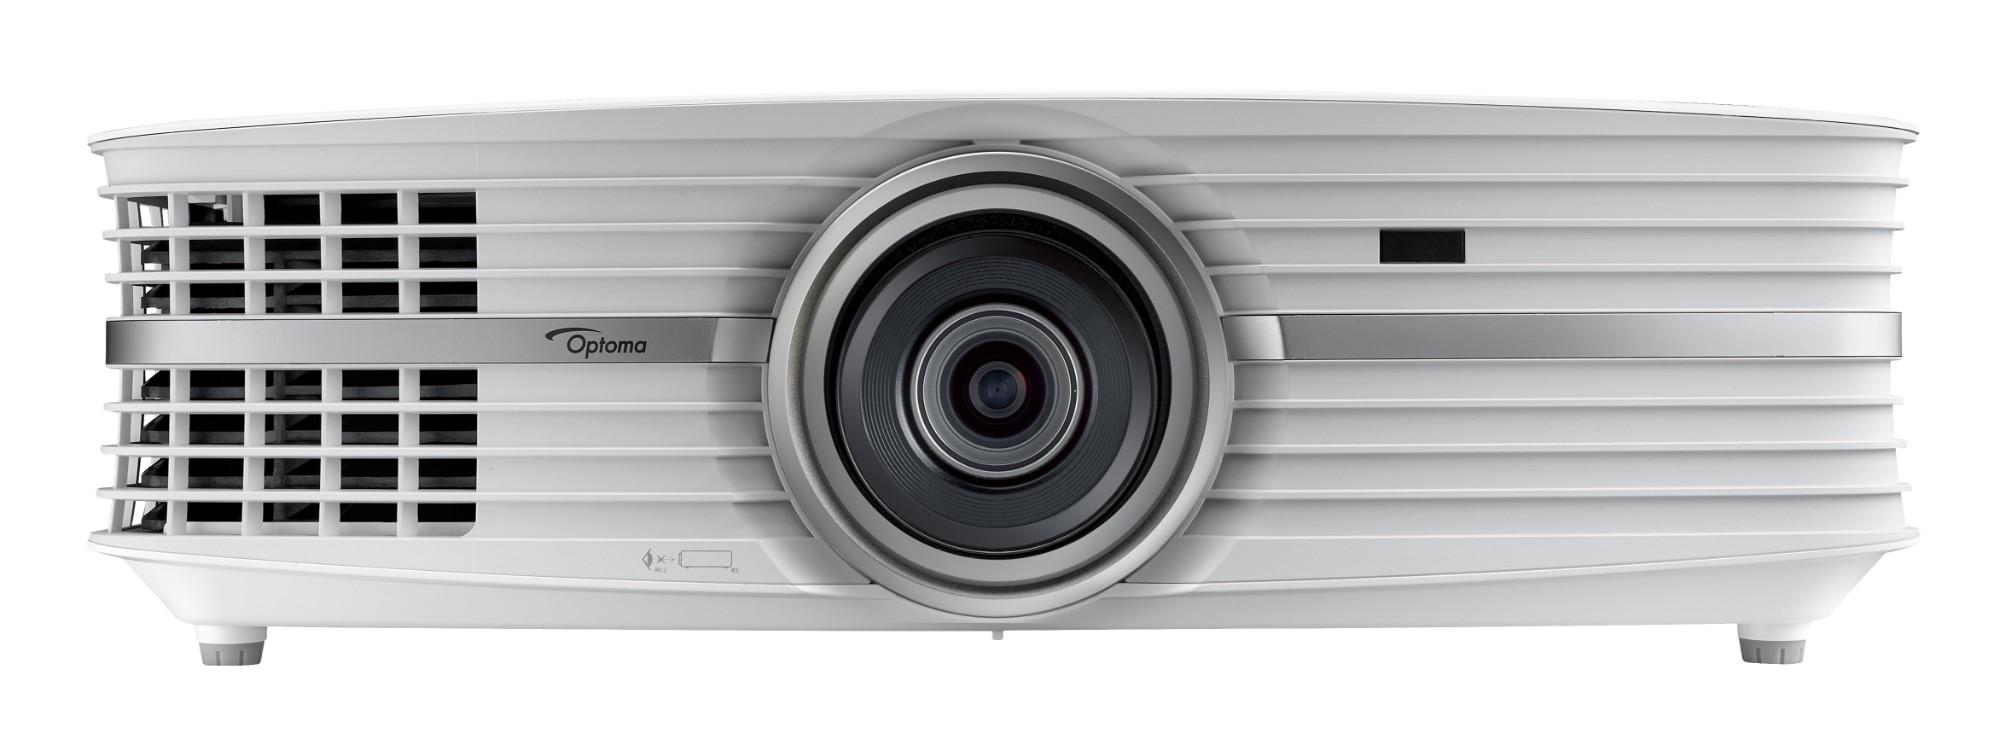 Optoma UHD60 beamer/projector 3000 ANSI lumens DLP 2160p (3840x2160) Desktopprojector Wit